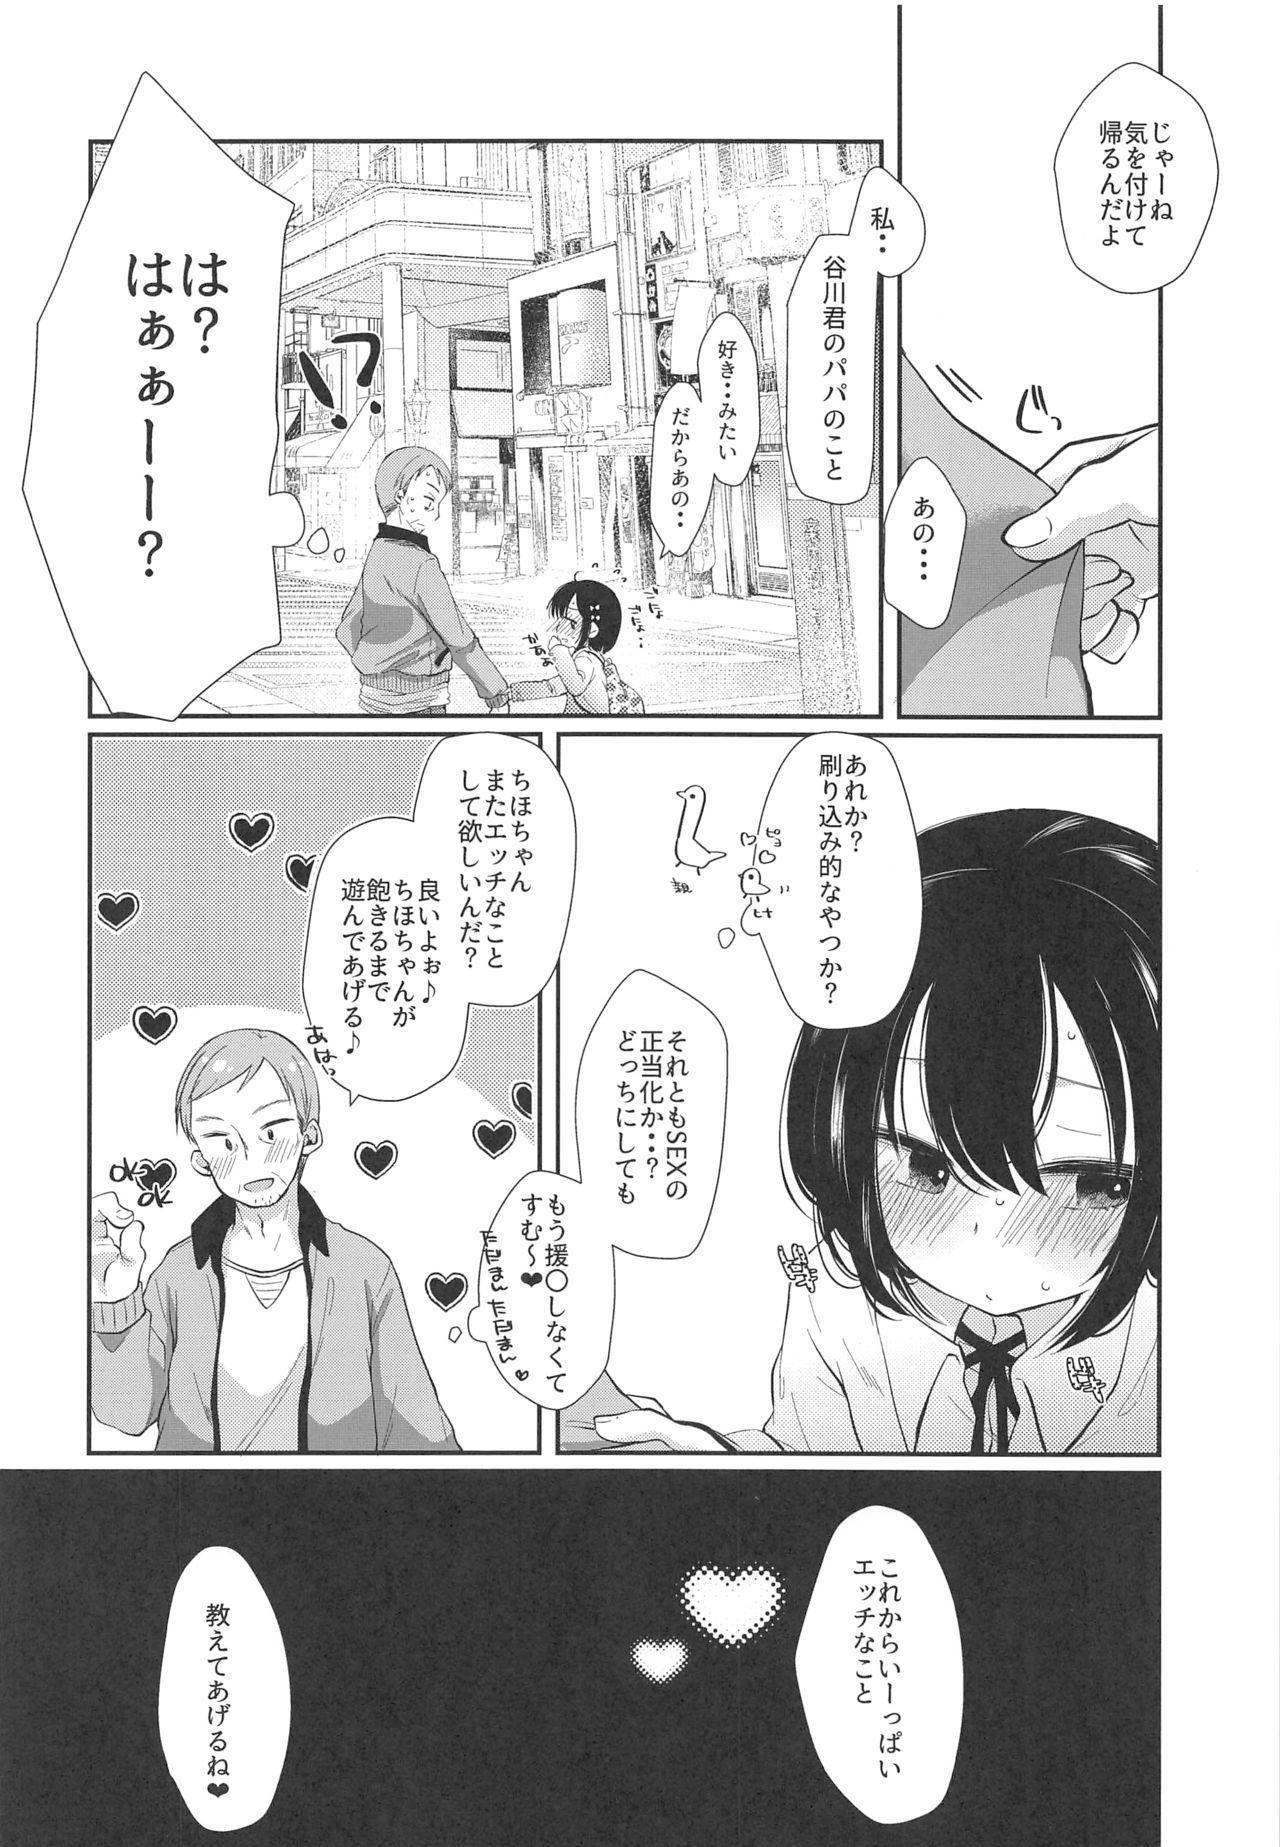 Hajimete wa Classmate no Papa 25